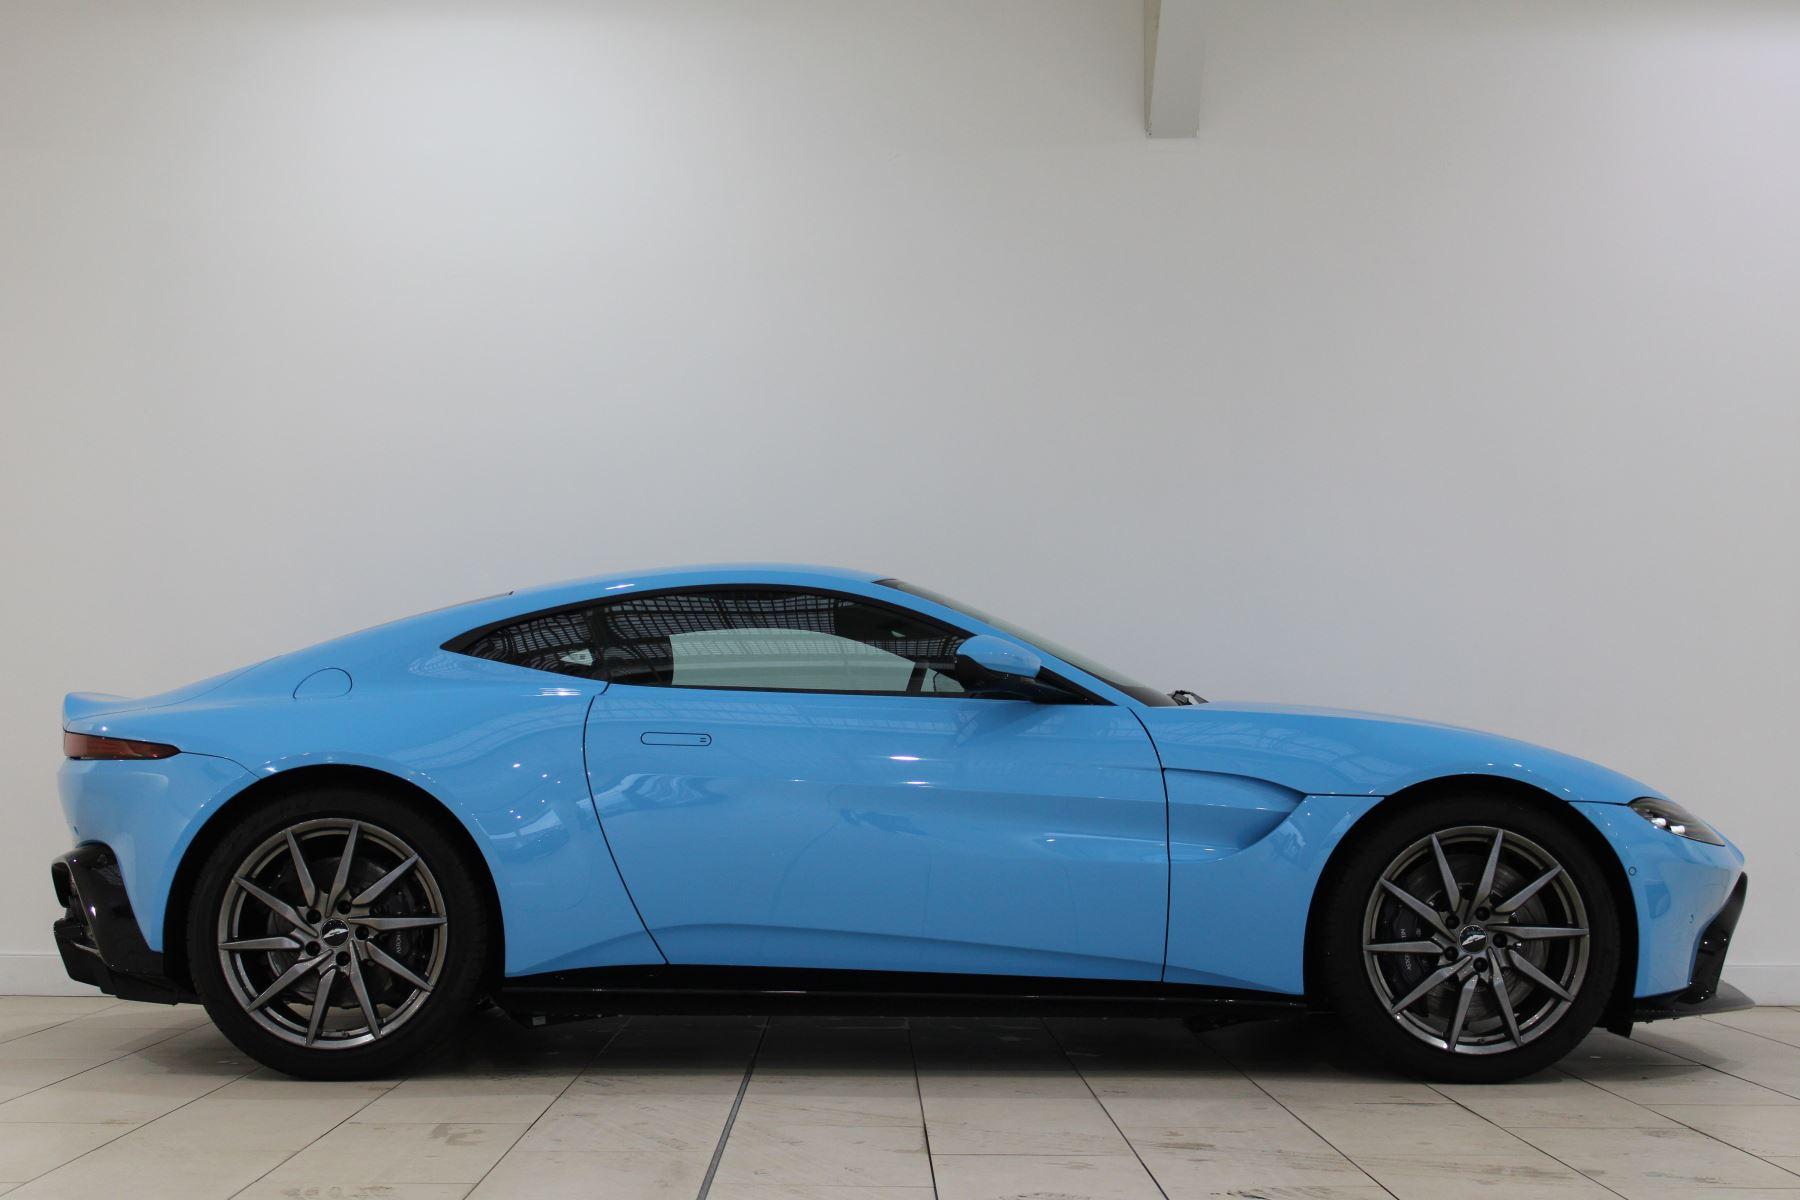 Aston Martin New Vantage 2dr image 3